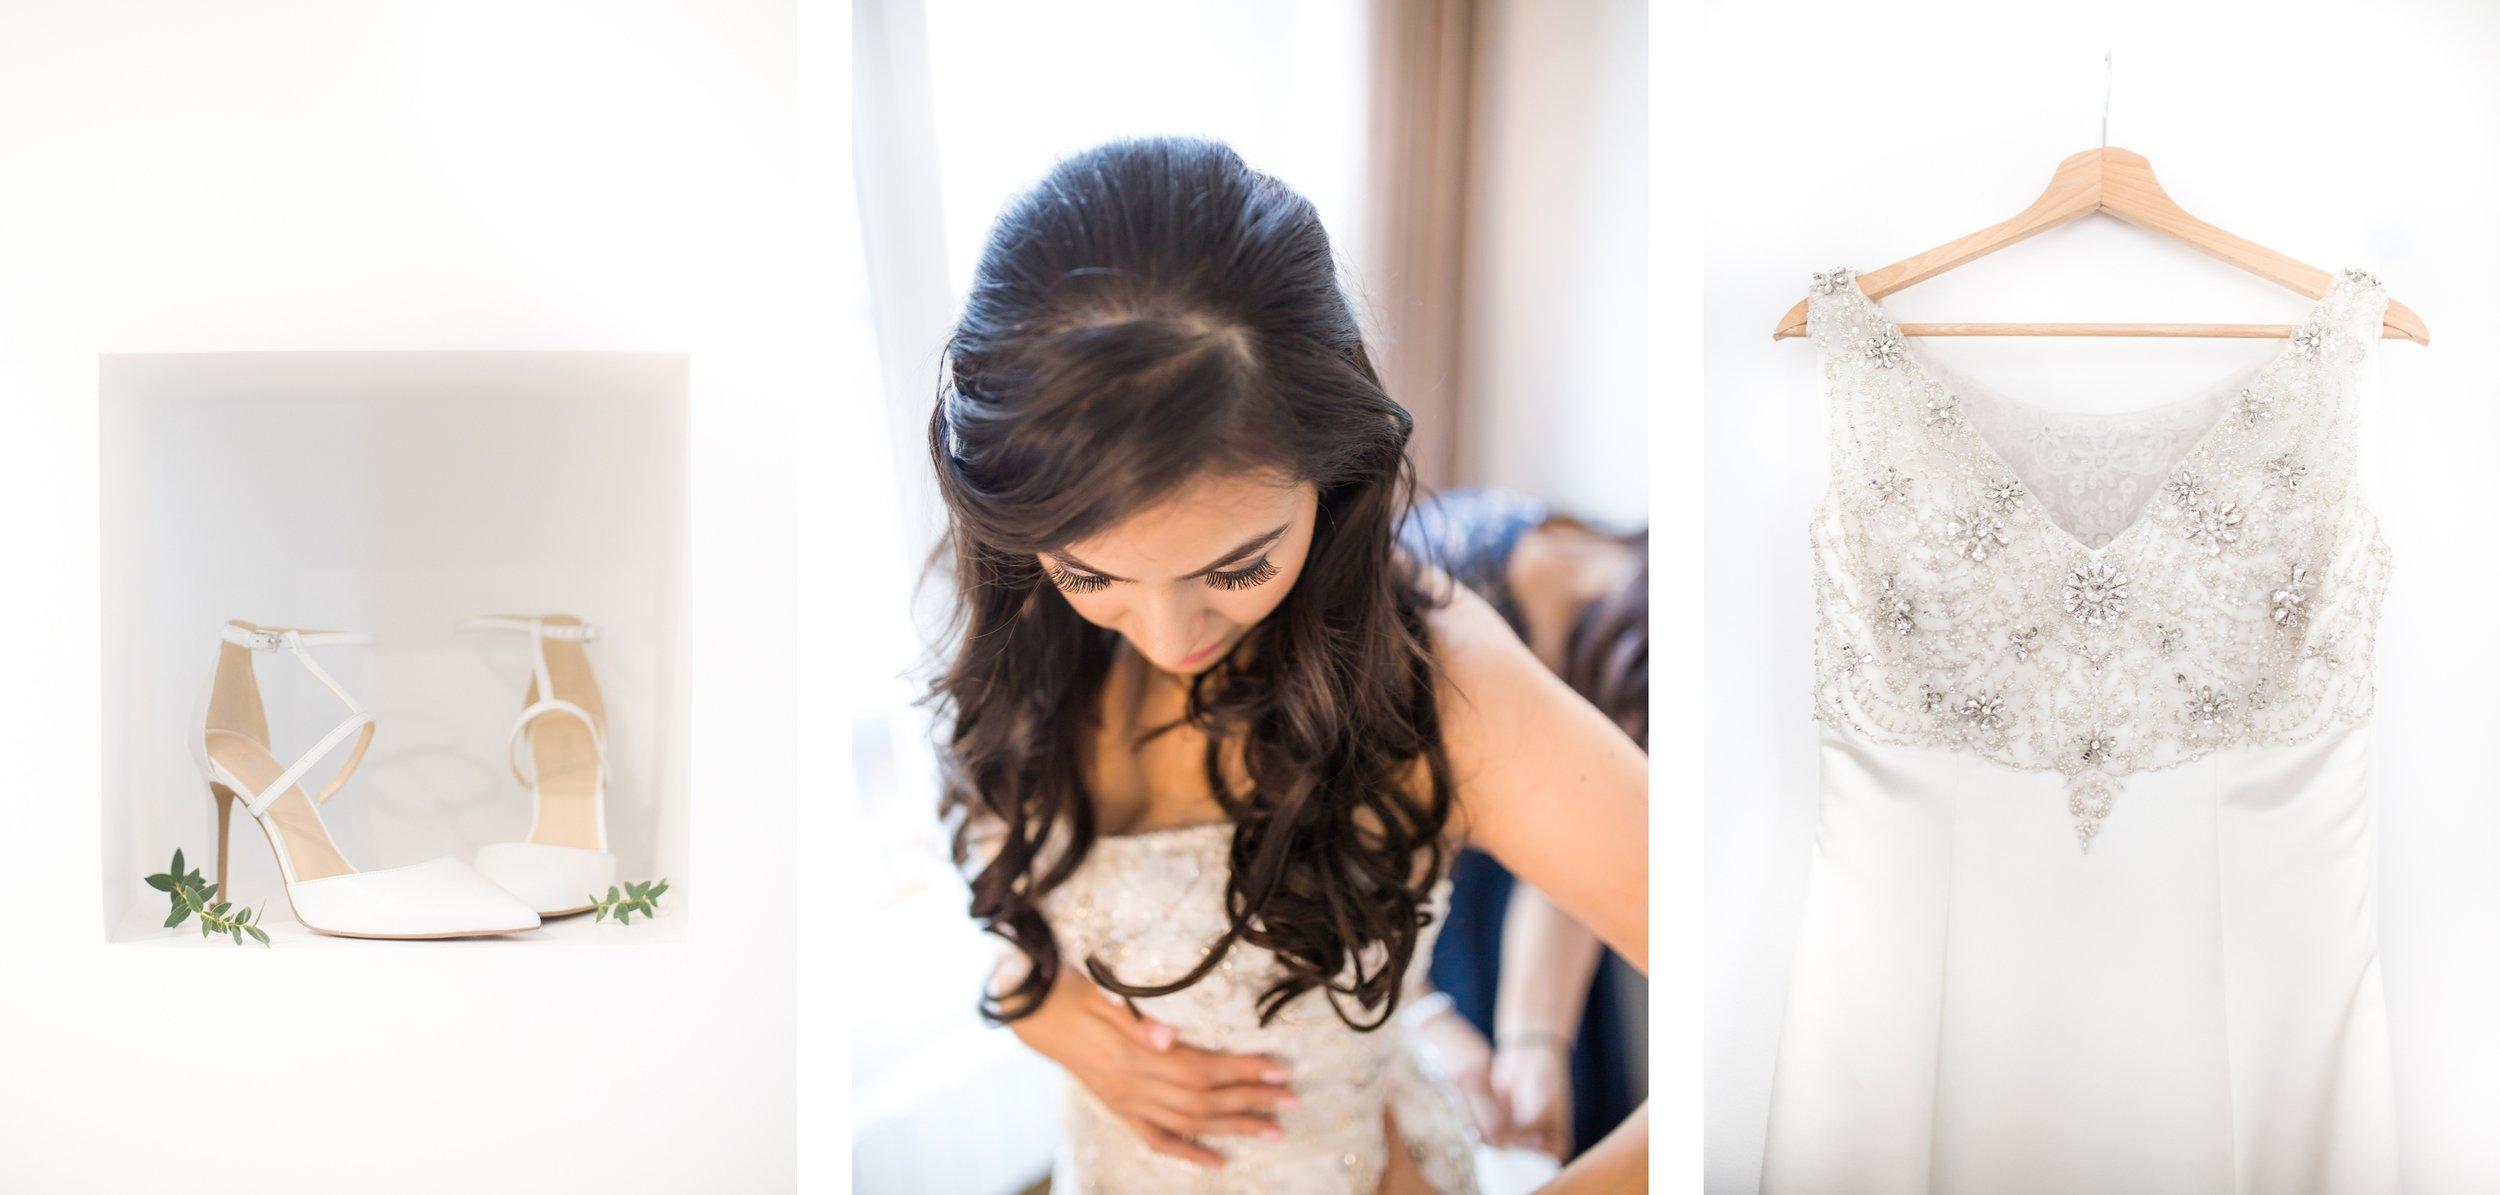 Rainey_Gregg_Photography_St._Simons_Island_Georgia_California_Wedding_Portrait_Photography_0241.jpg